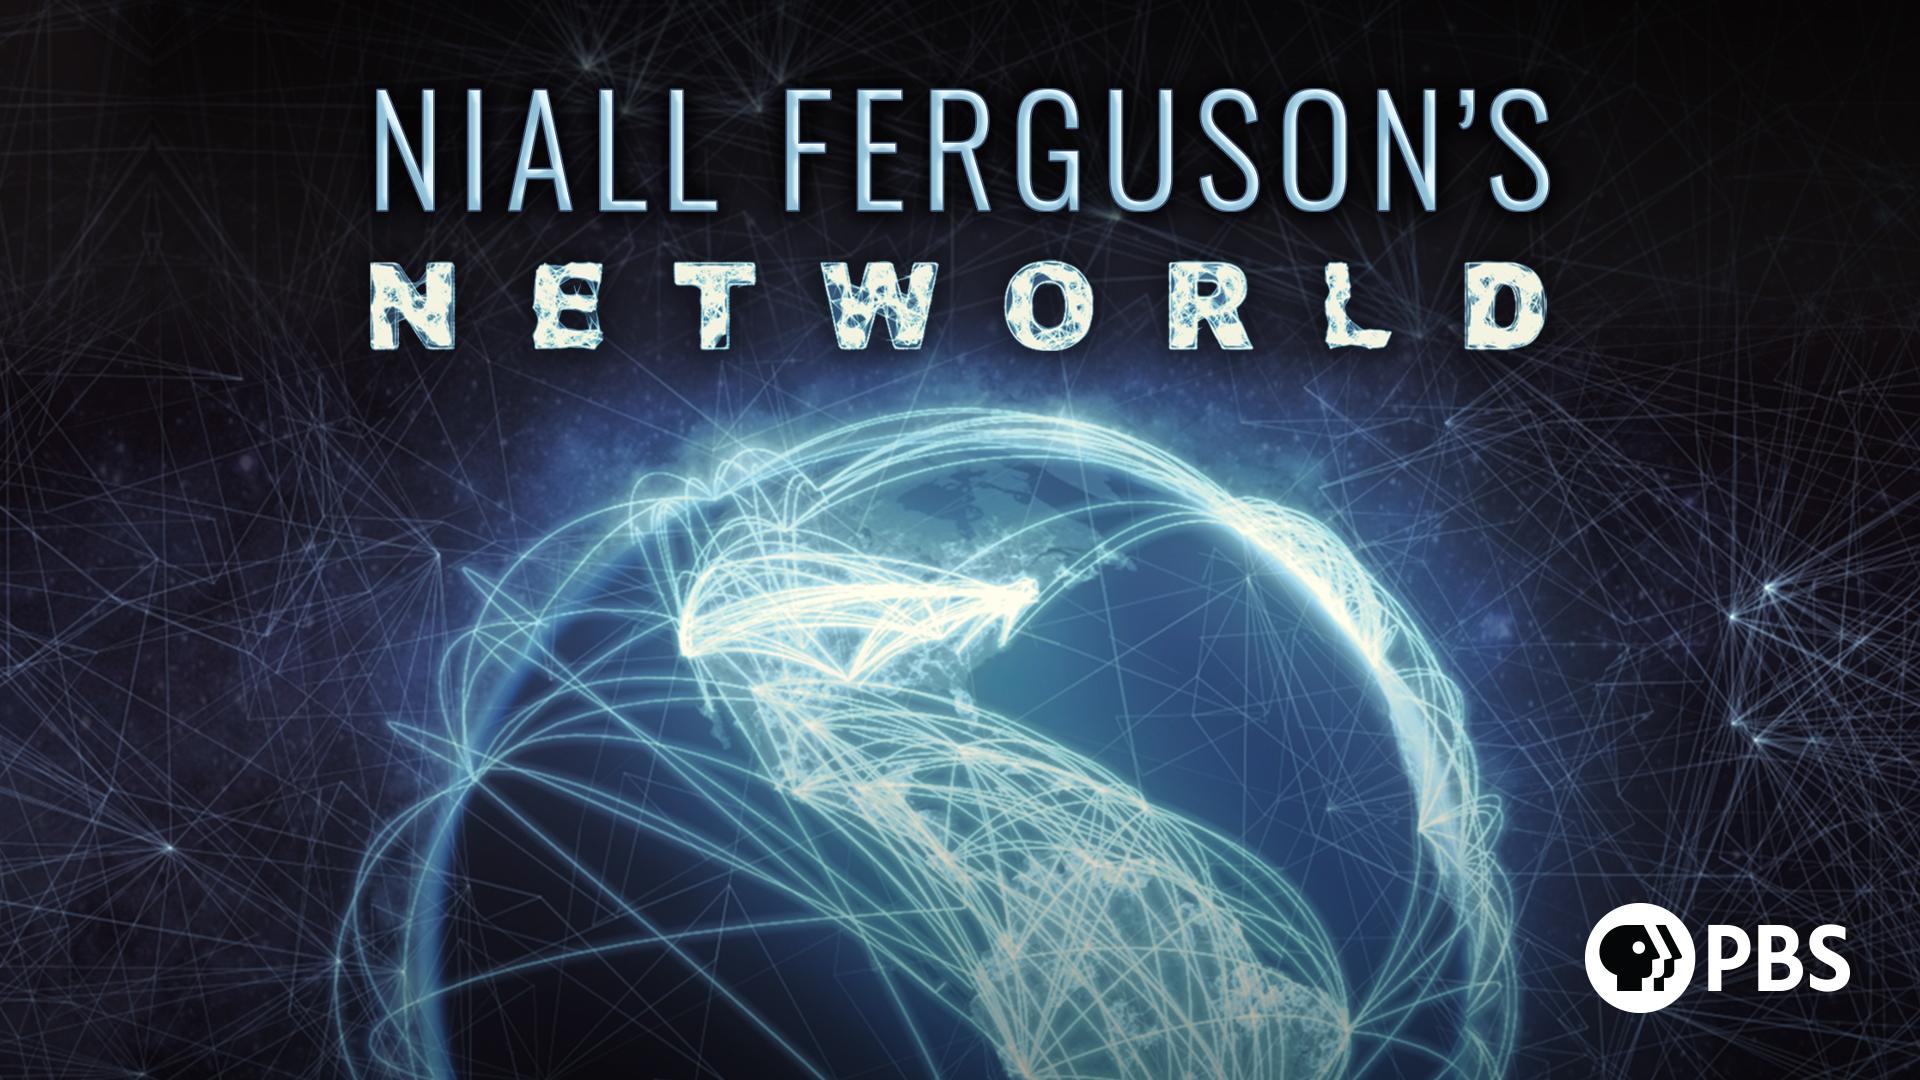 Niall Ferguson's Networld: Season 1